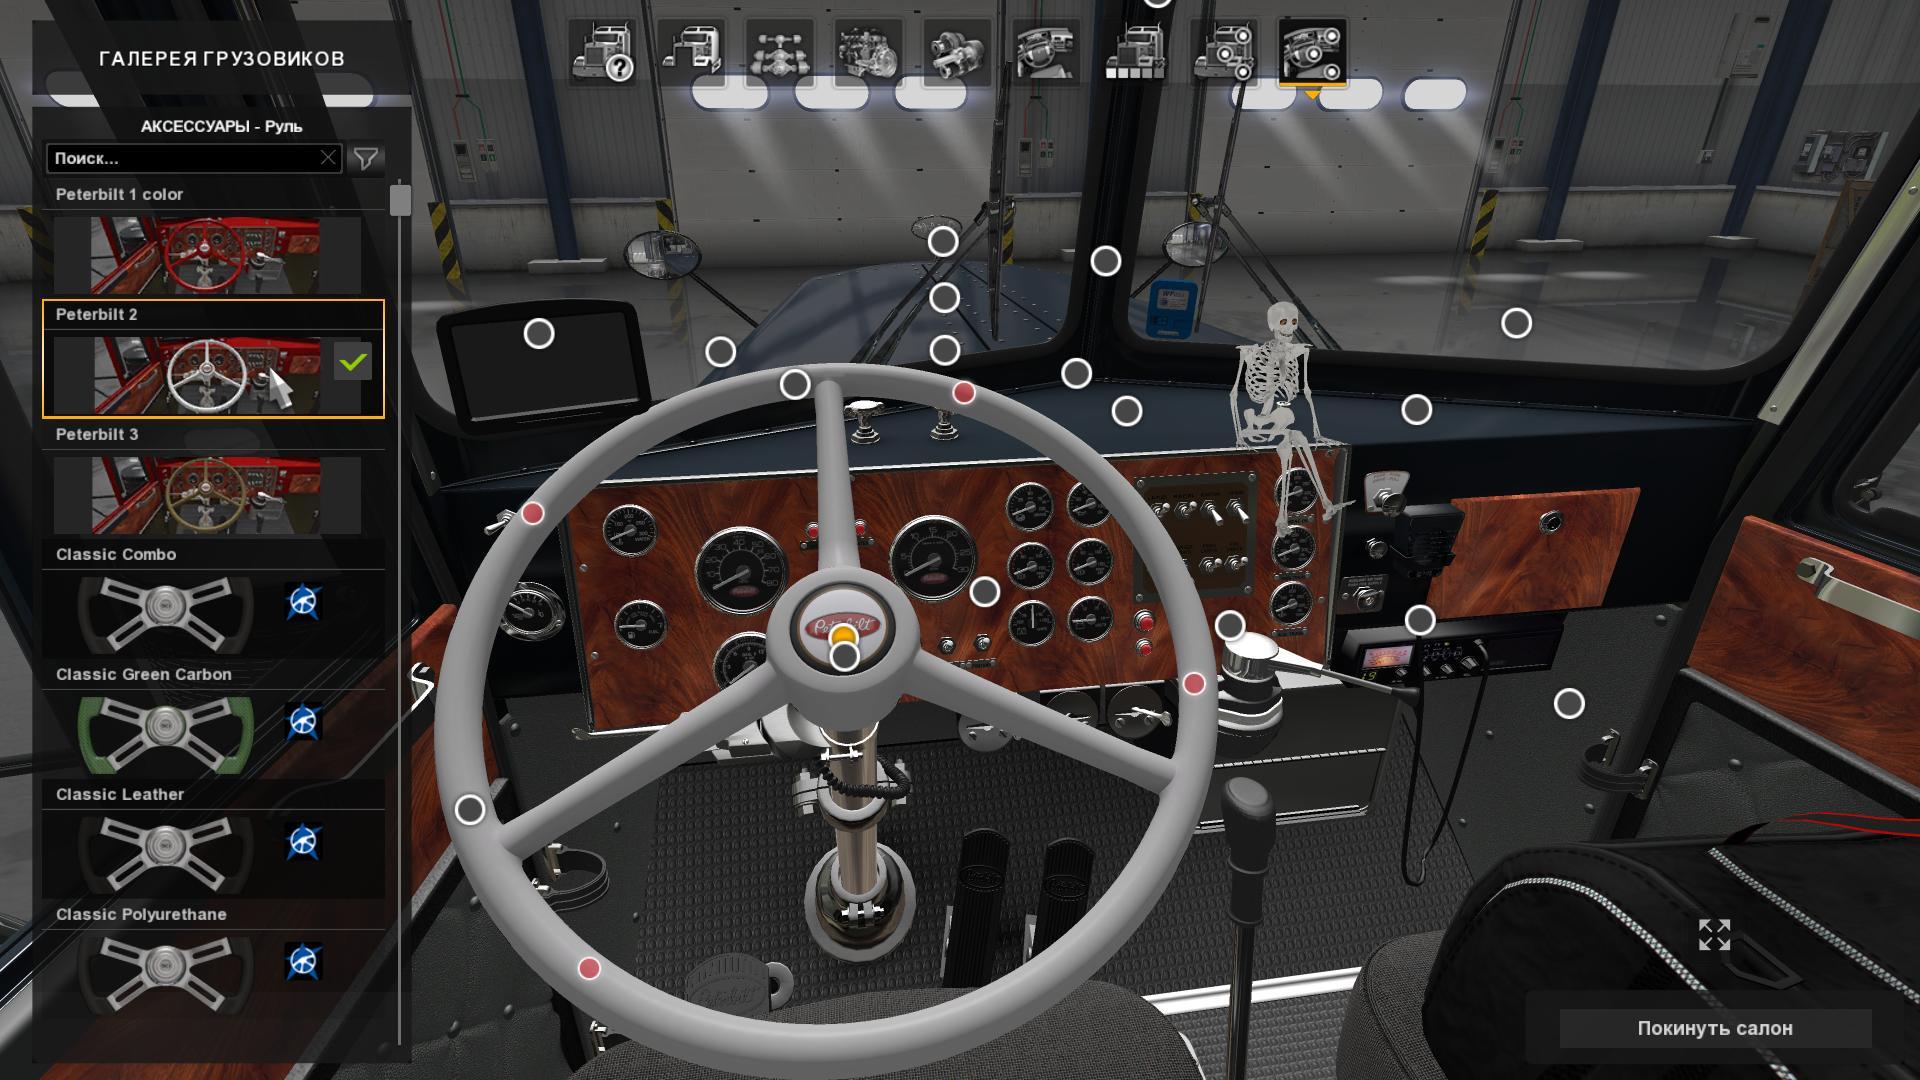 Peterbilt 281 351 Mtg 2 0 1 6 X 1 6 1 8s Truck For Ats Ats Mod